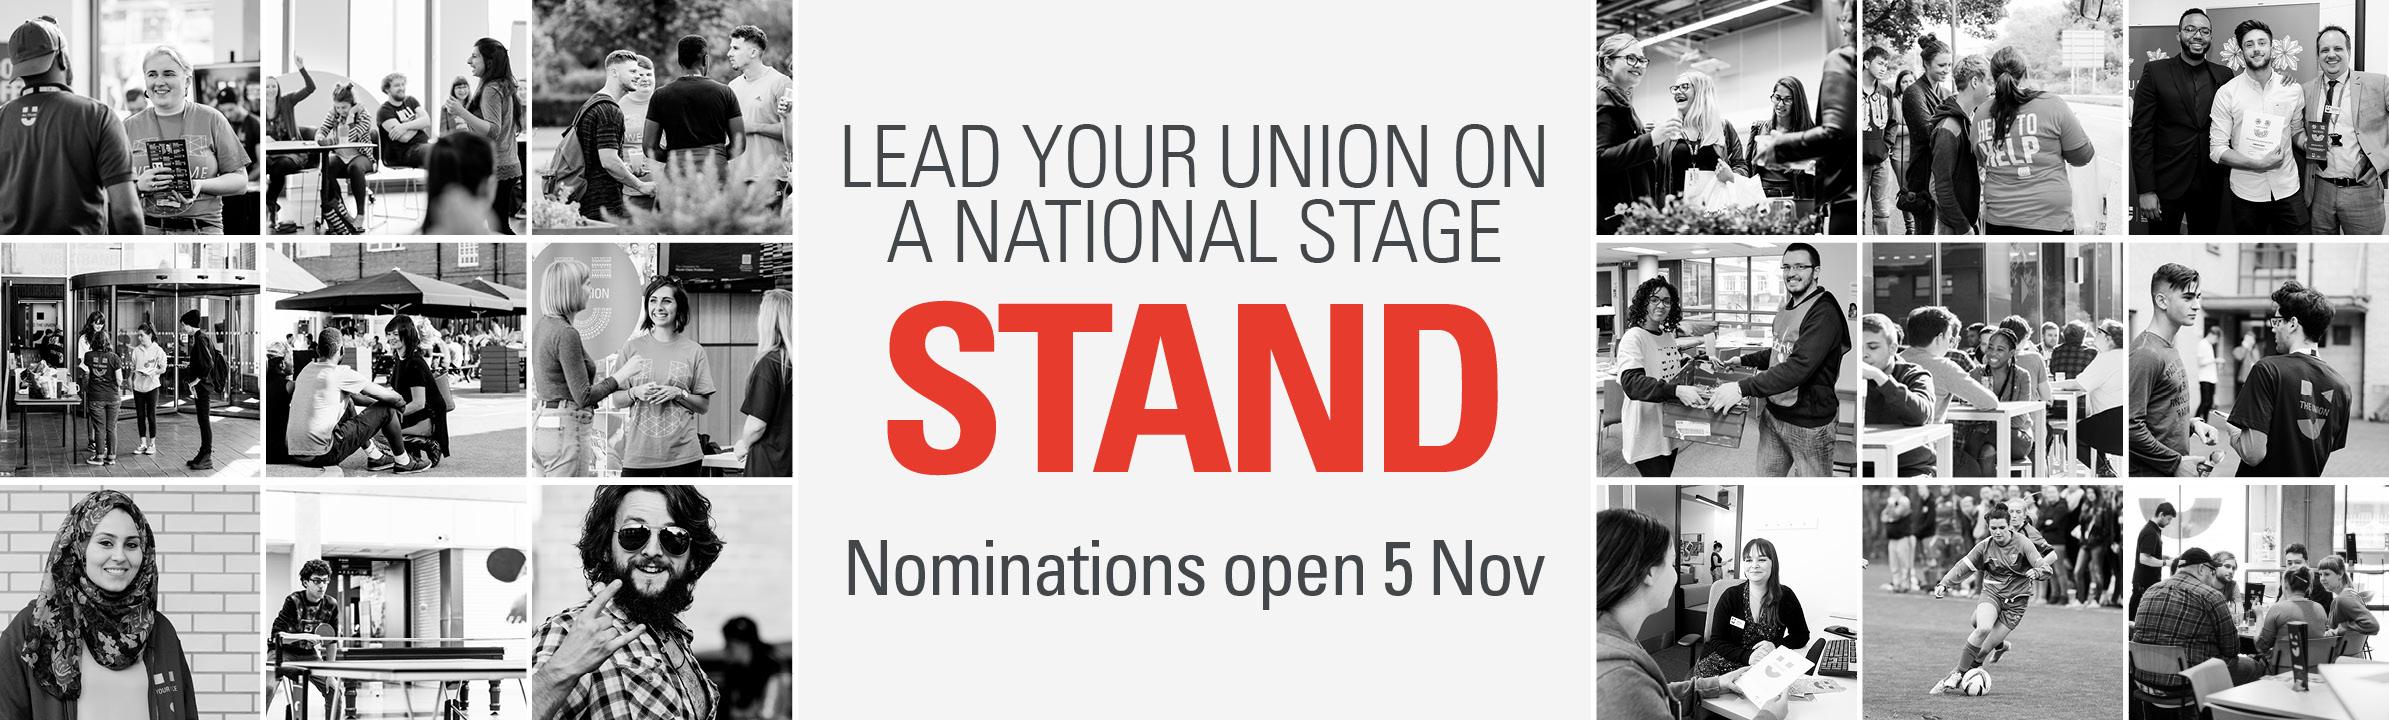 Hp nusdelegateelections2018 stand v3